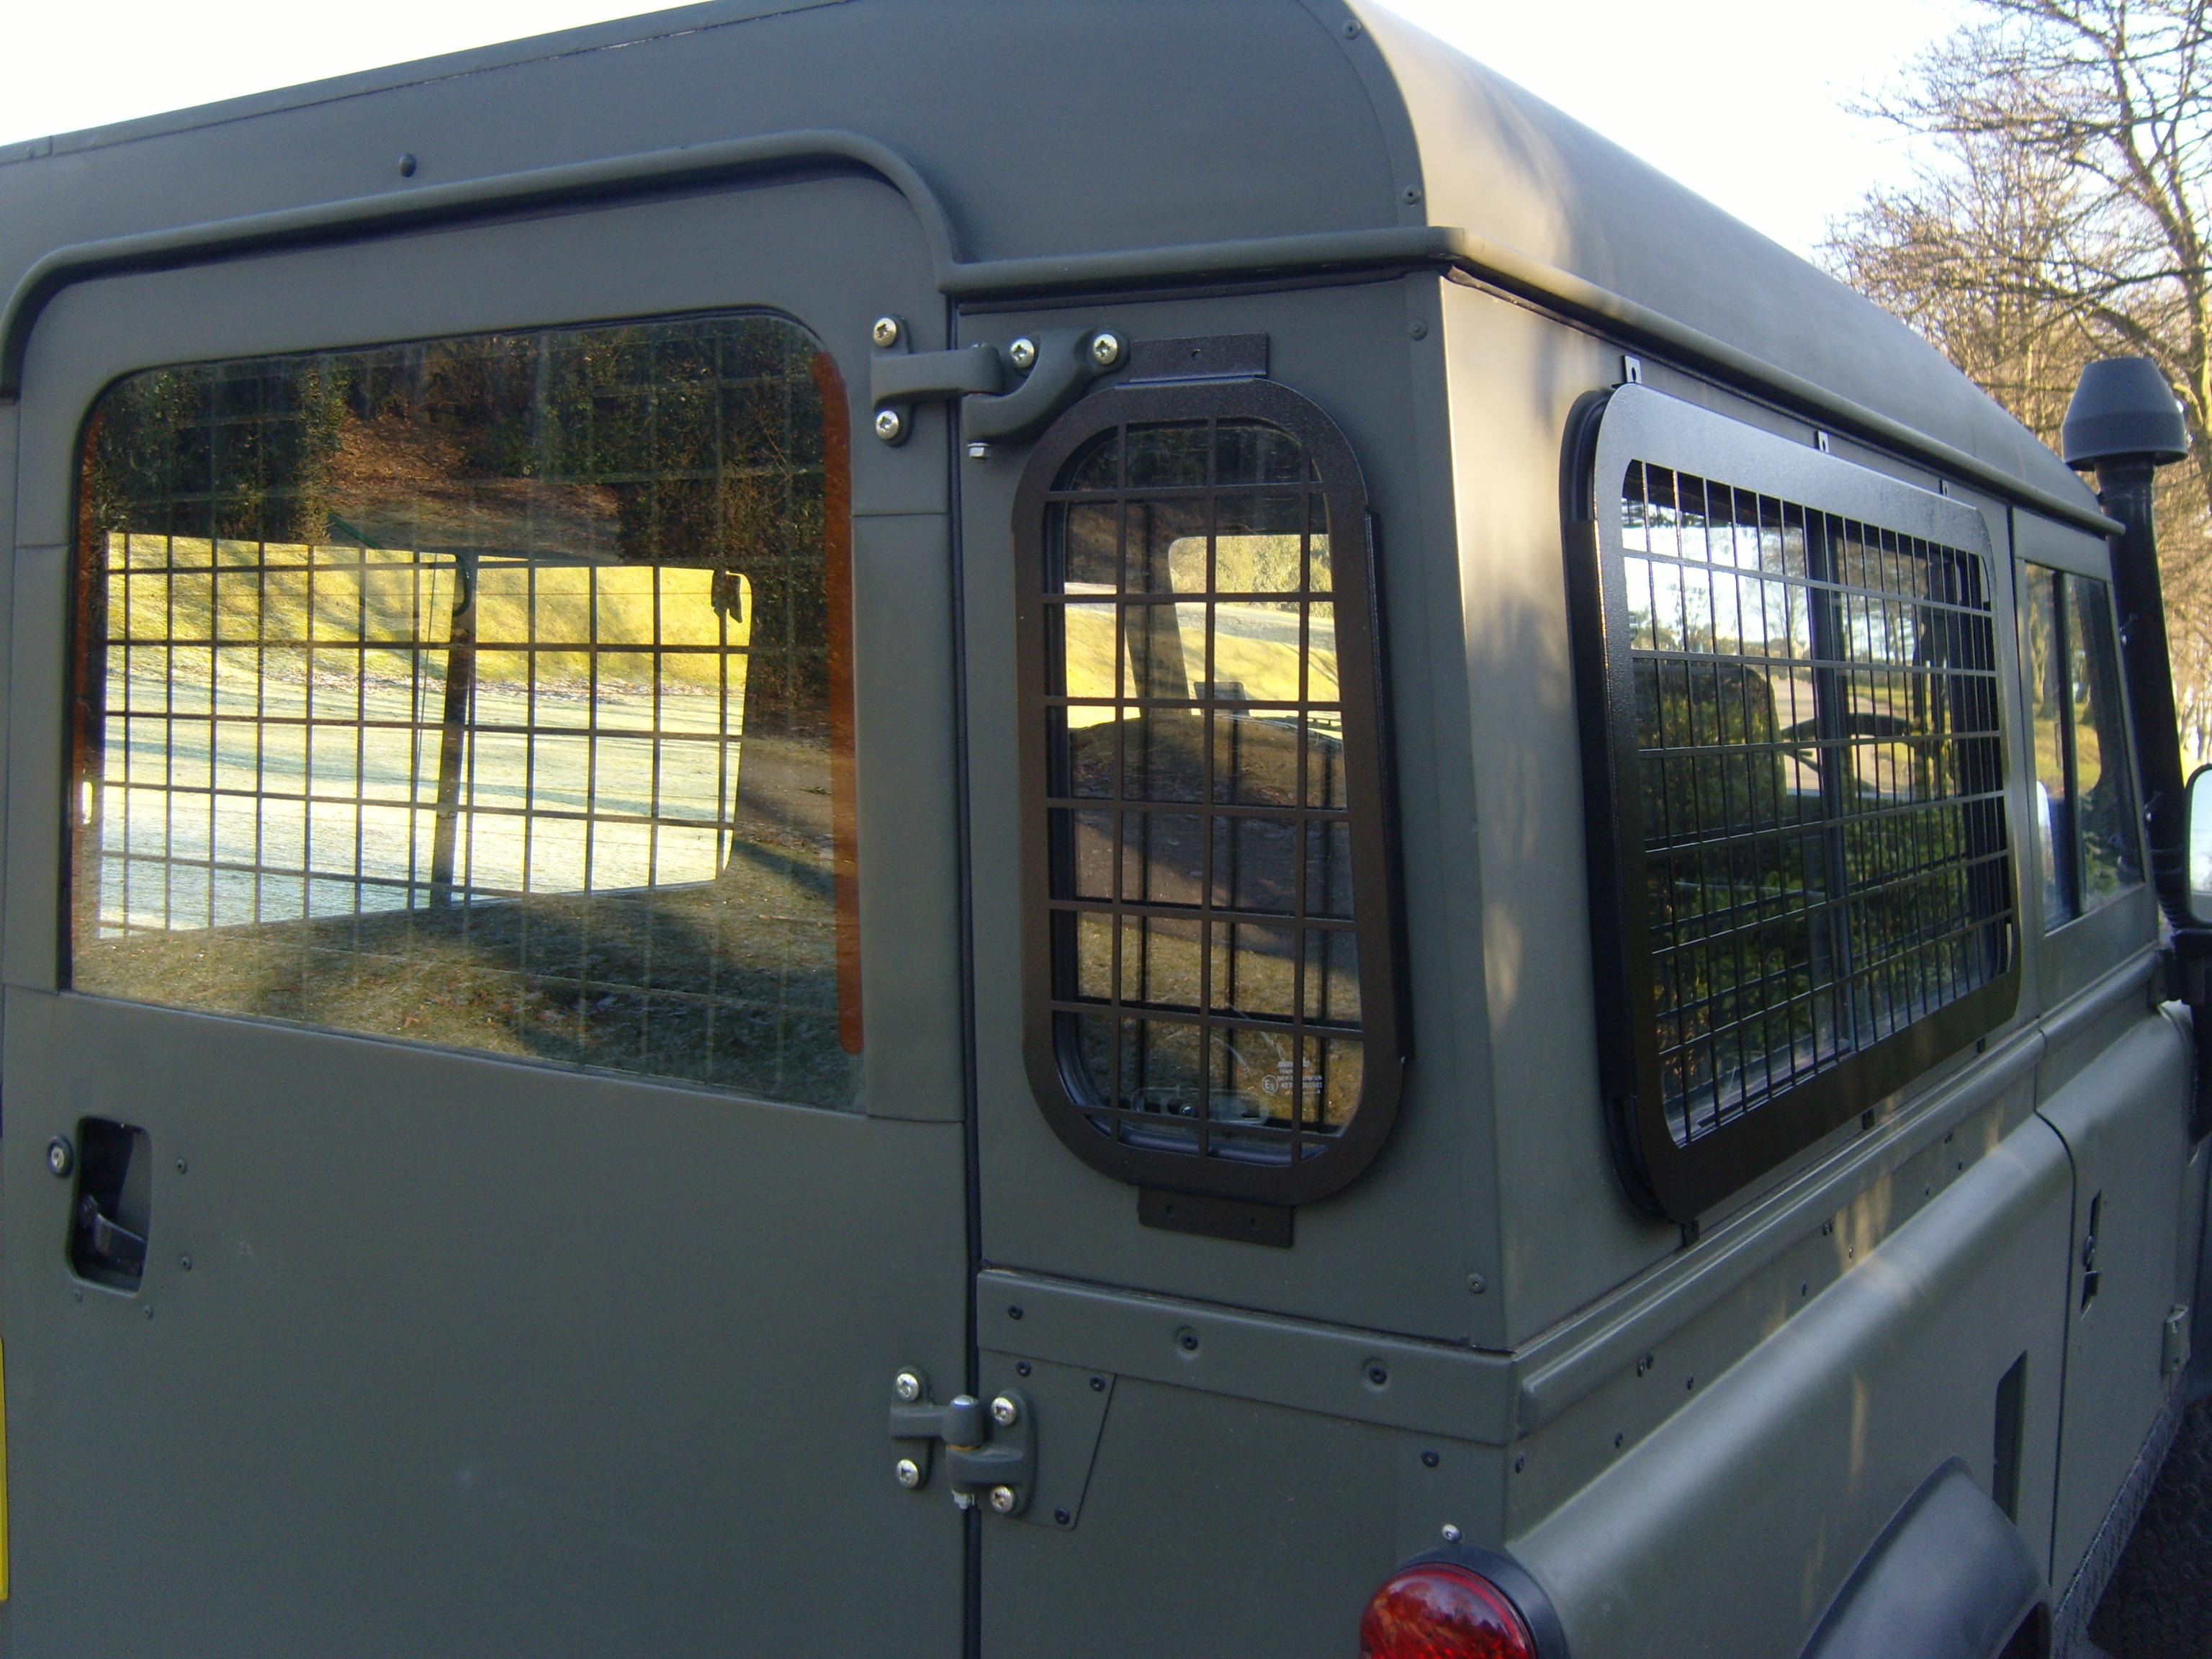 Security Window Grills